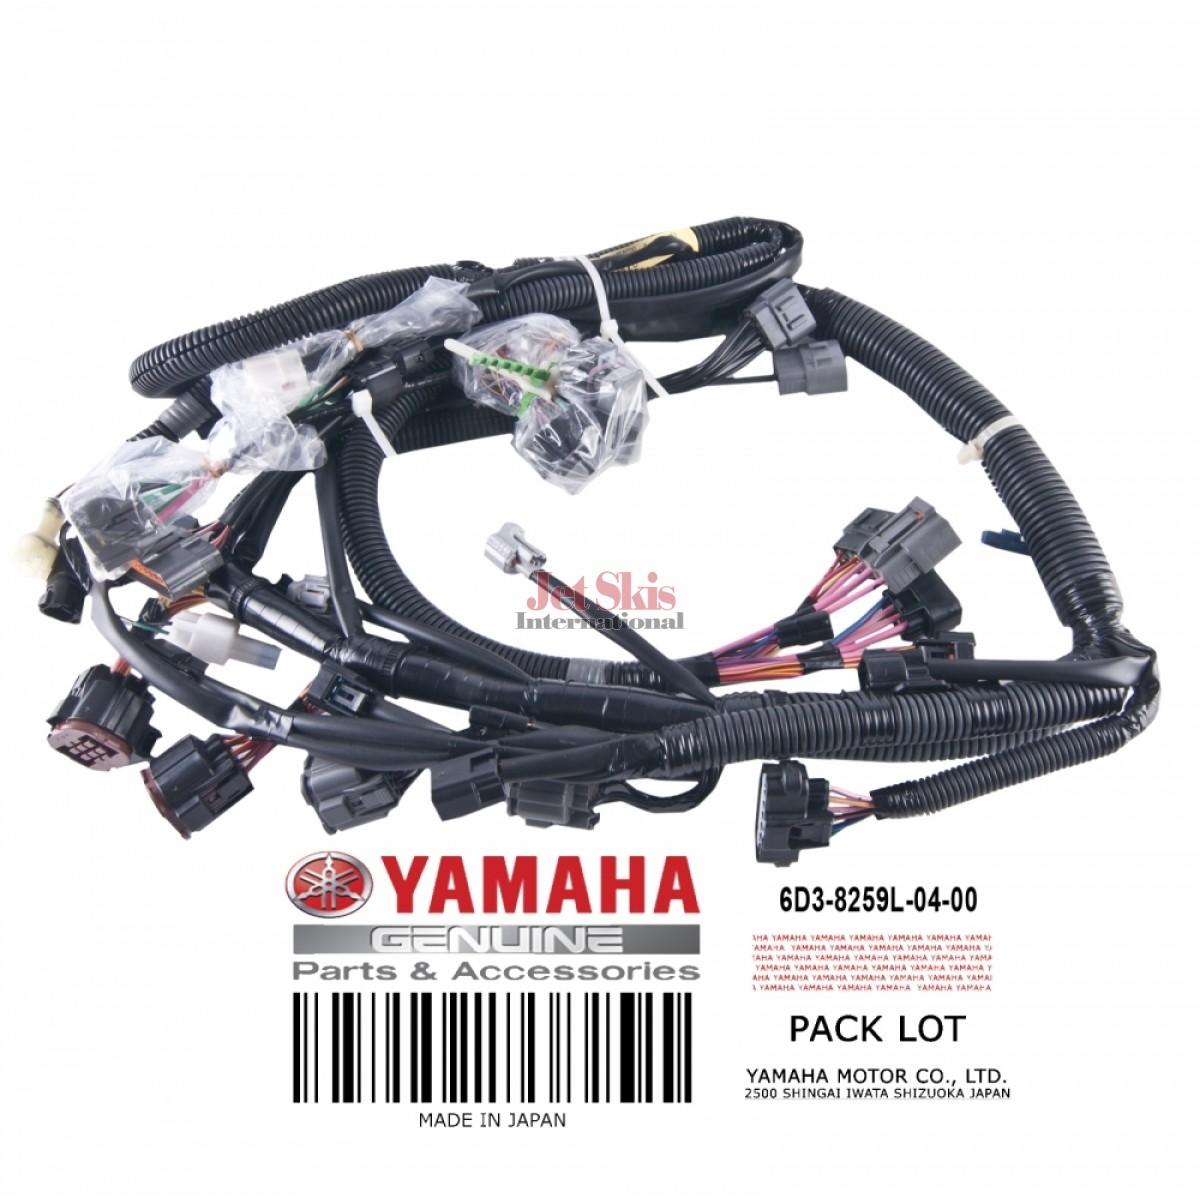 YAMAHA 6D3-8259L-04-00 WIRE HARNESS ASSEMBLY   Jet Skis International